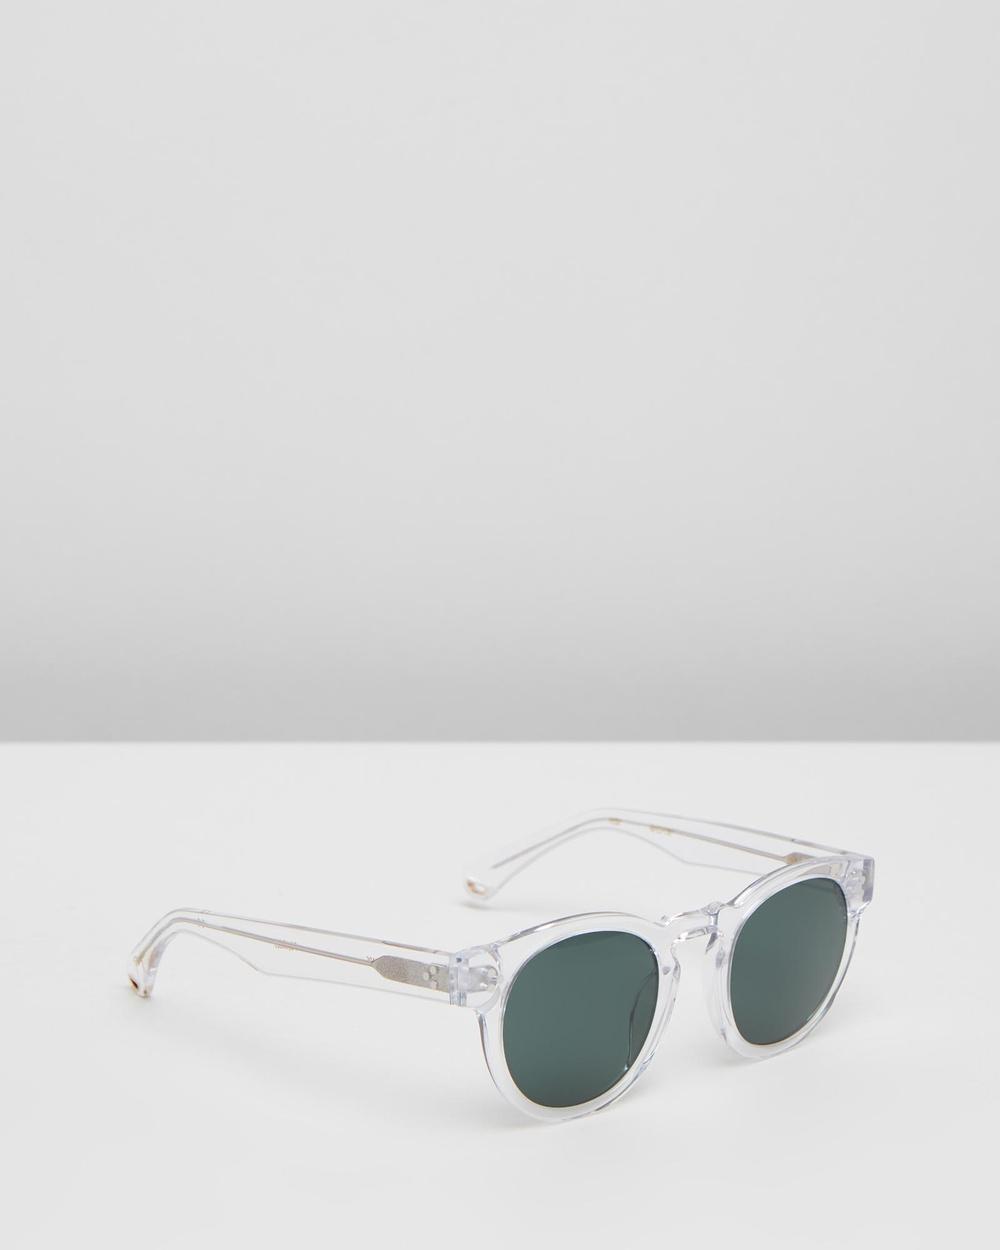 Pacifico Optical Lola Sunglasses White